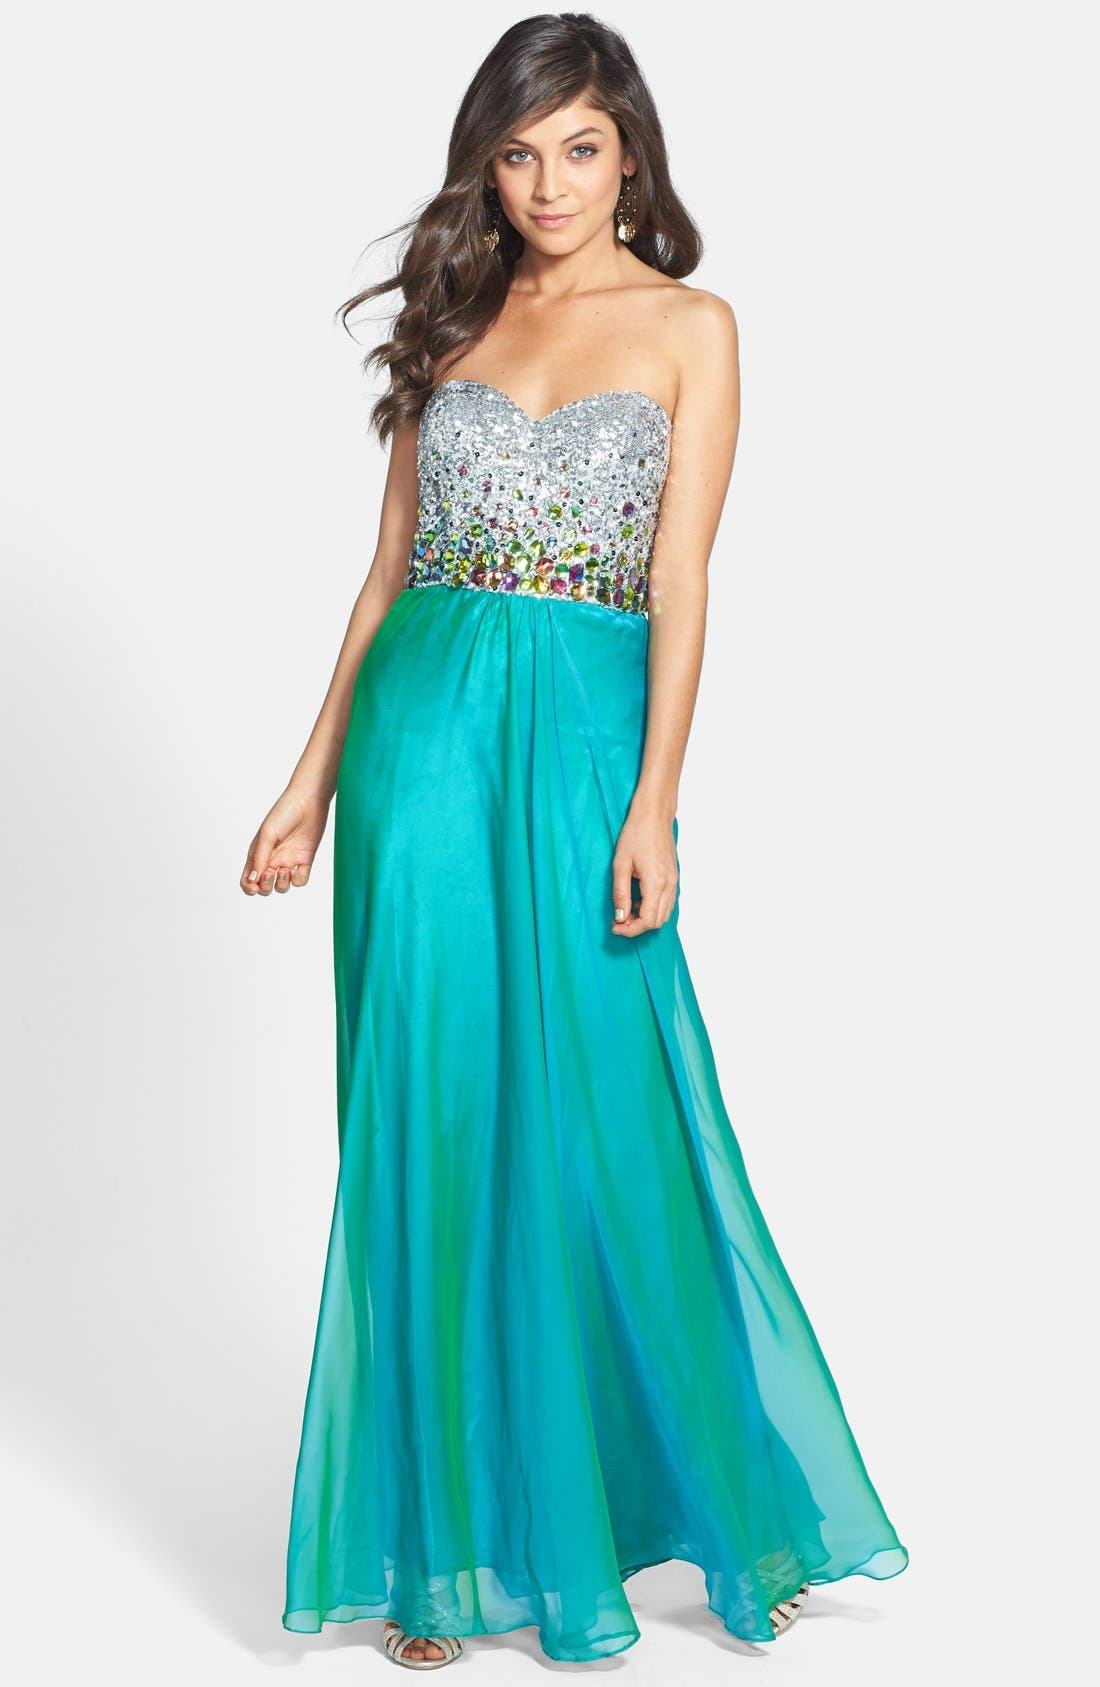 Alternate Image 1 Selected - Faviana Embellished Bodice Chiffon Gown